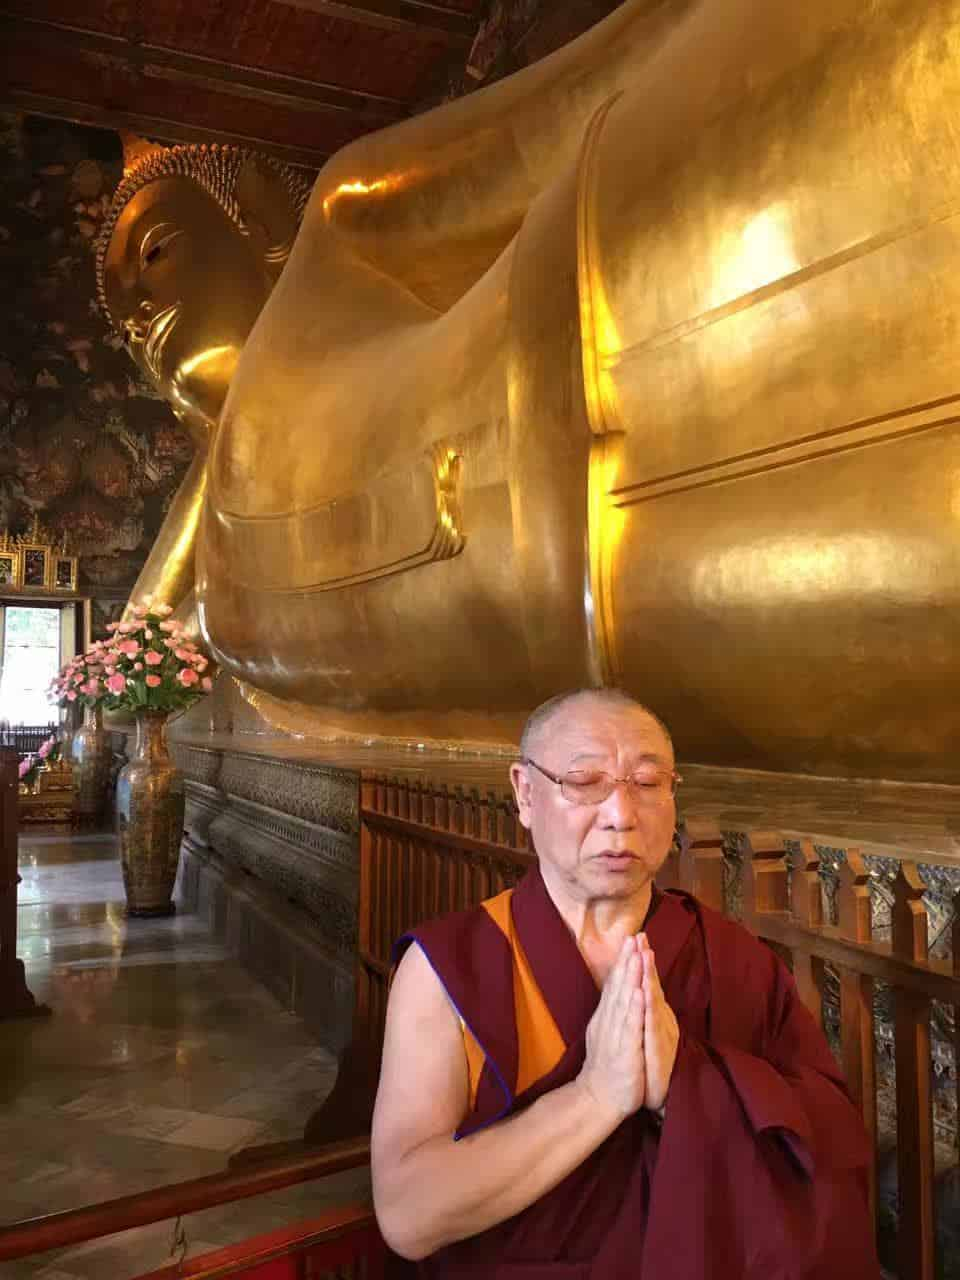 Gosok Rinpoche Thailand 2017 T020 1f0abe6cf5be3c0913c4407d2012efa